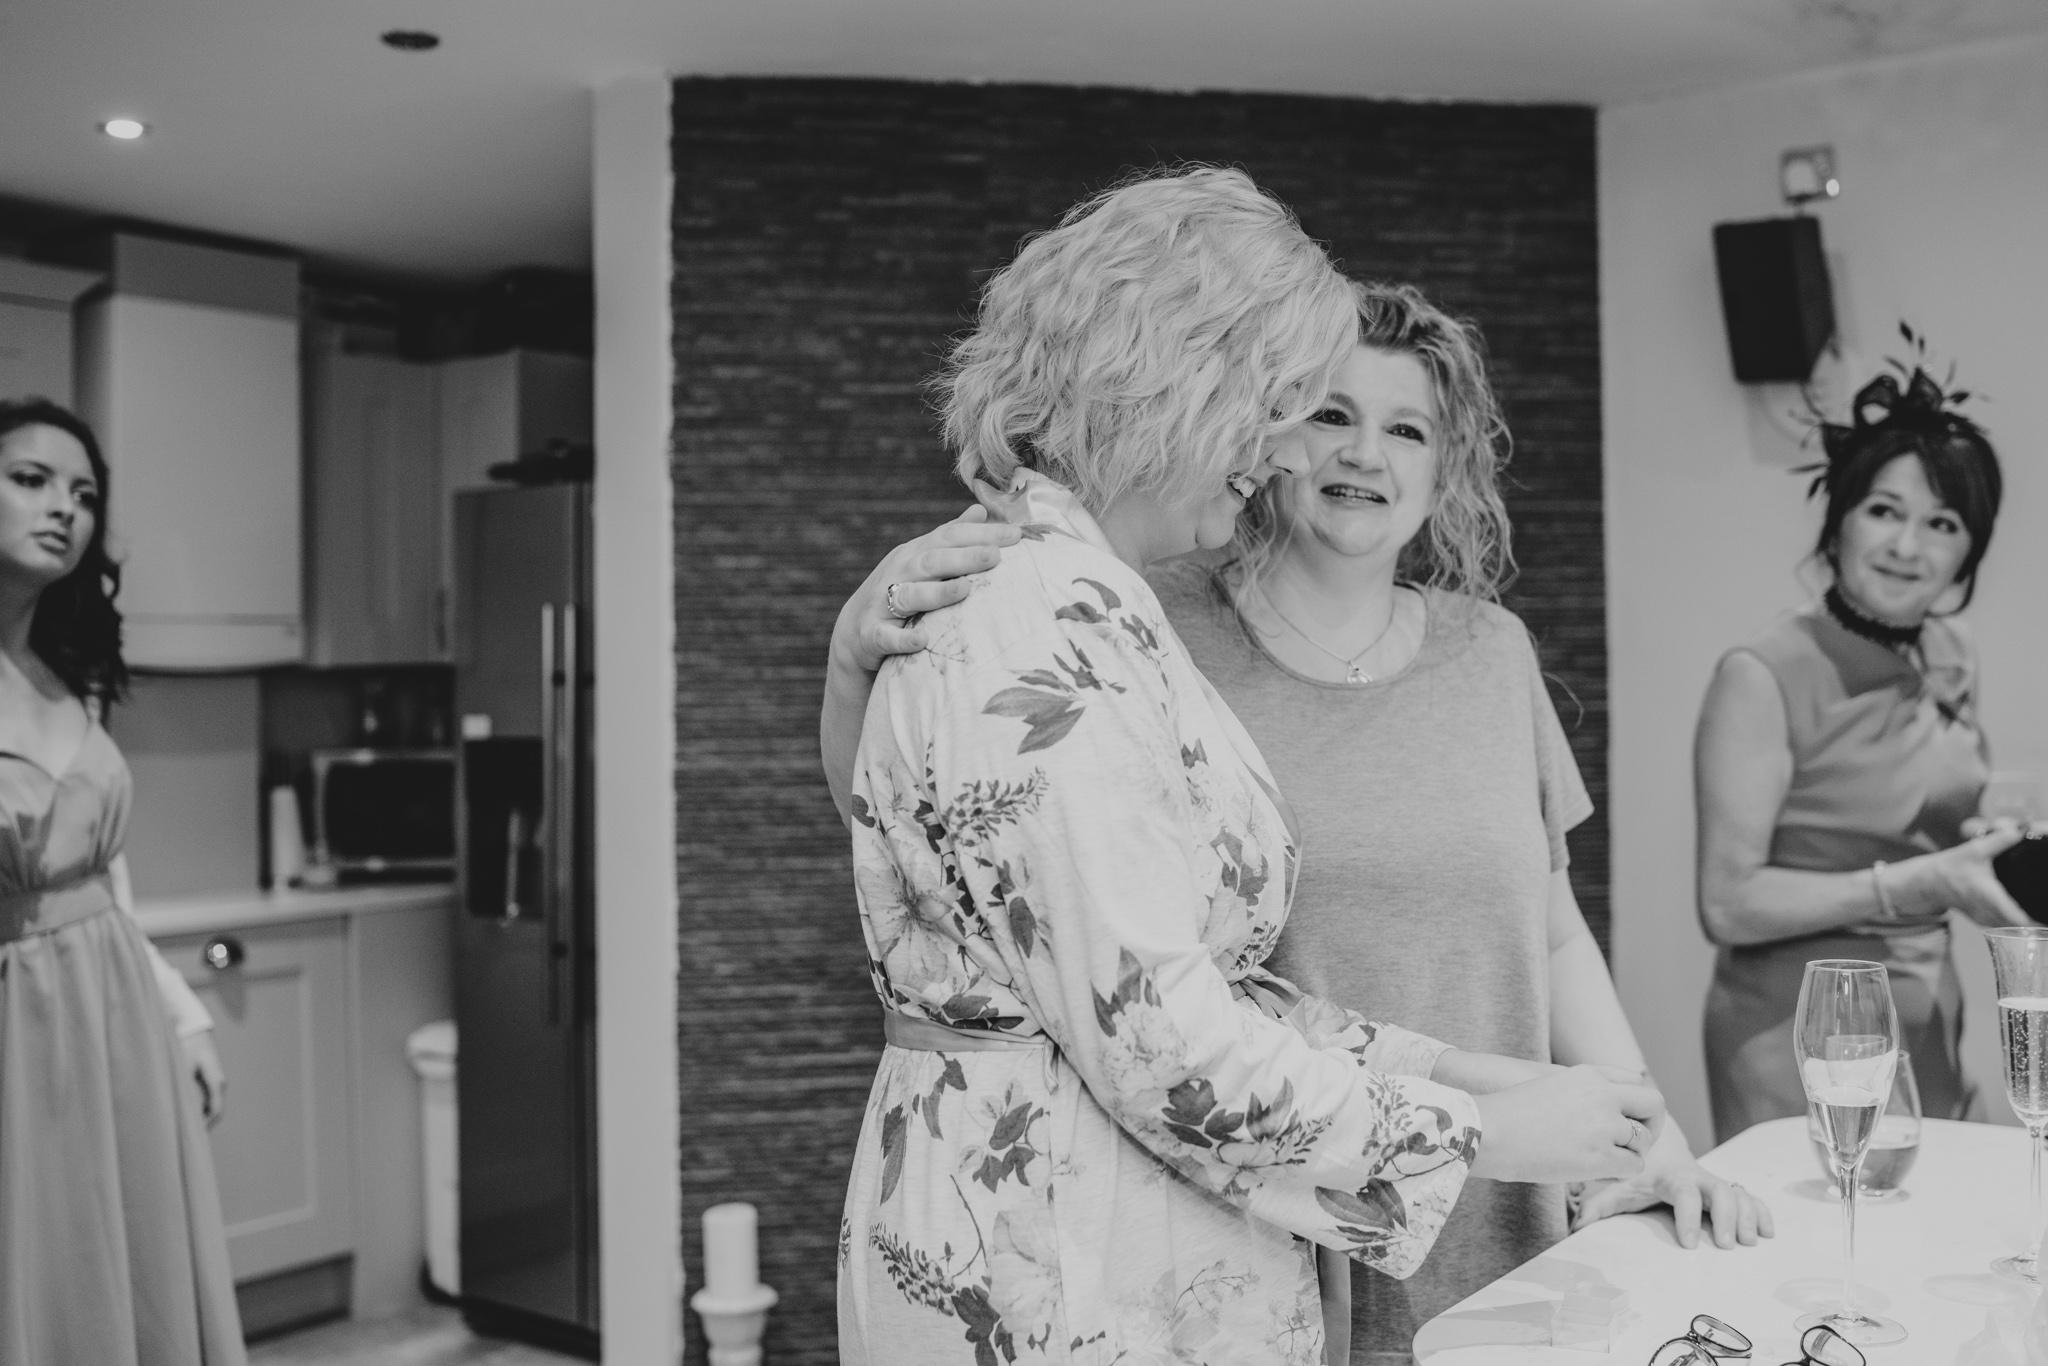 rhia-james-rustic-crabbs-barn-vintage-50s-retro-wedding-grace-elizabeth-colchester-essex-alternative-relaxed-wedding-family-photography-devon-suffolk-norfolk-essex (26 of 138).jpg